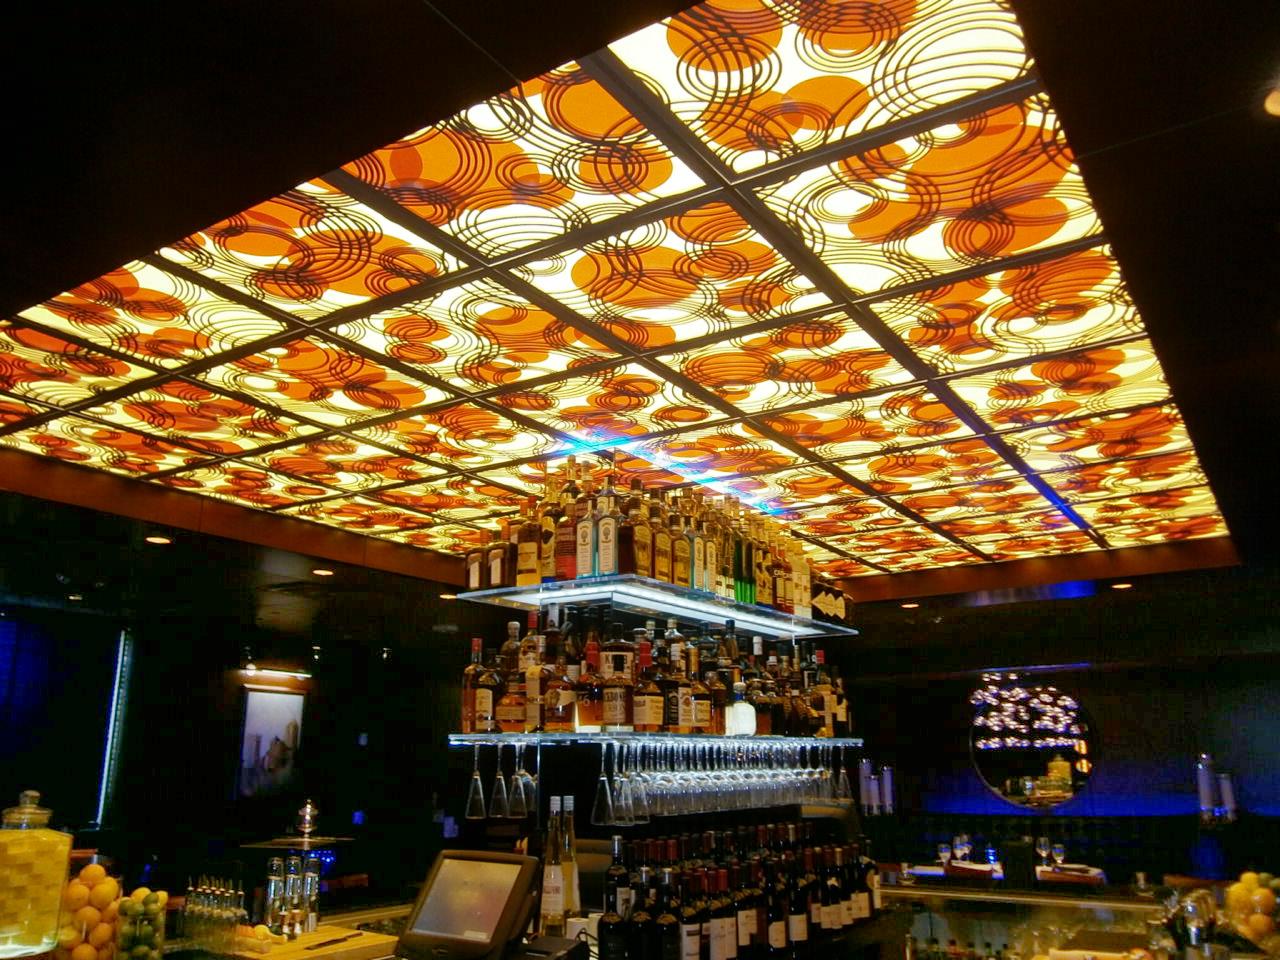 Ocean Prime Restaurant,Columbus, OH  - Buckeye Construction  Rain on Water, backlit ceiling panels